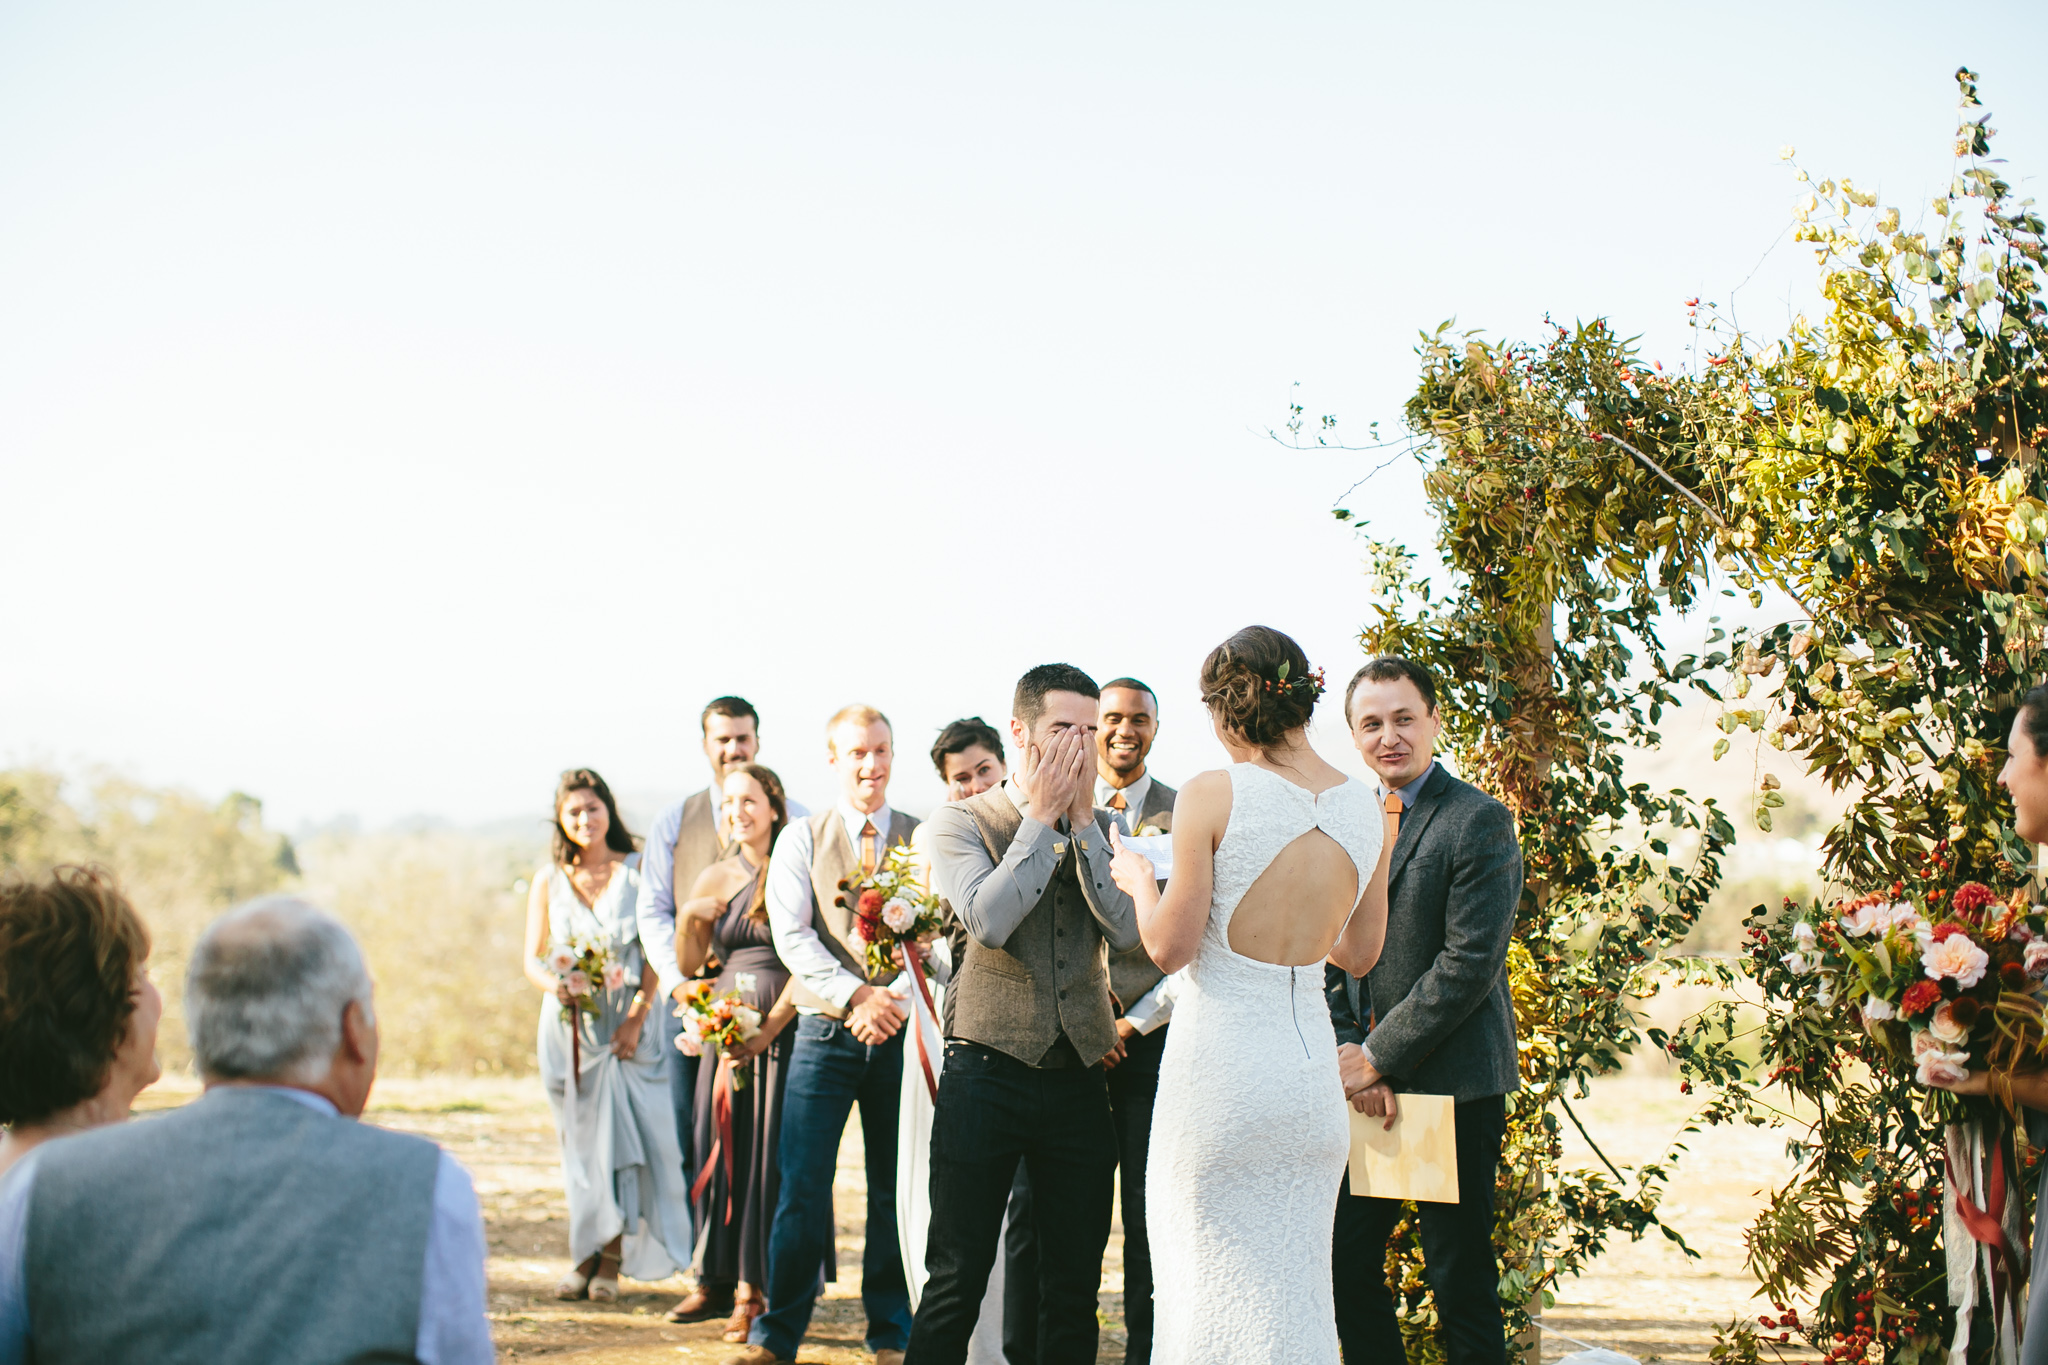 Kelly+Drew-WEDDING_KellyBoitano20160211_0123